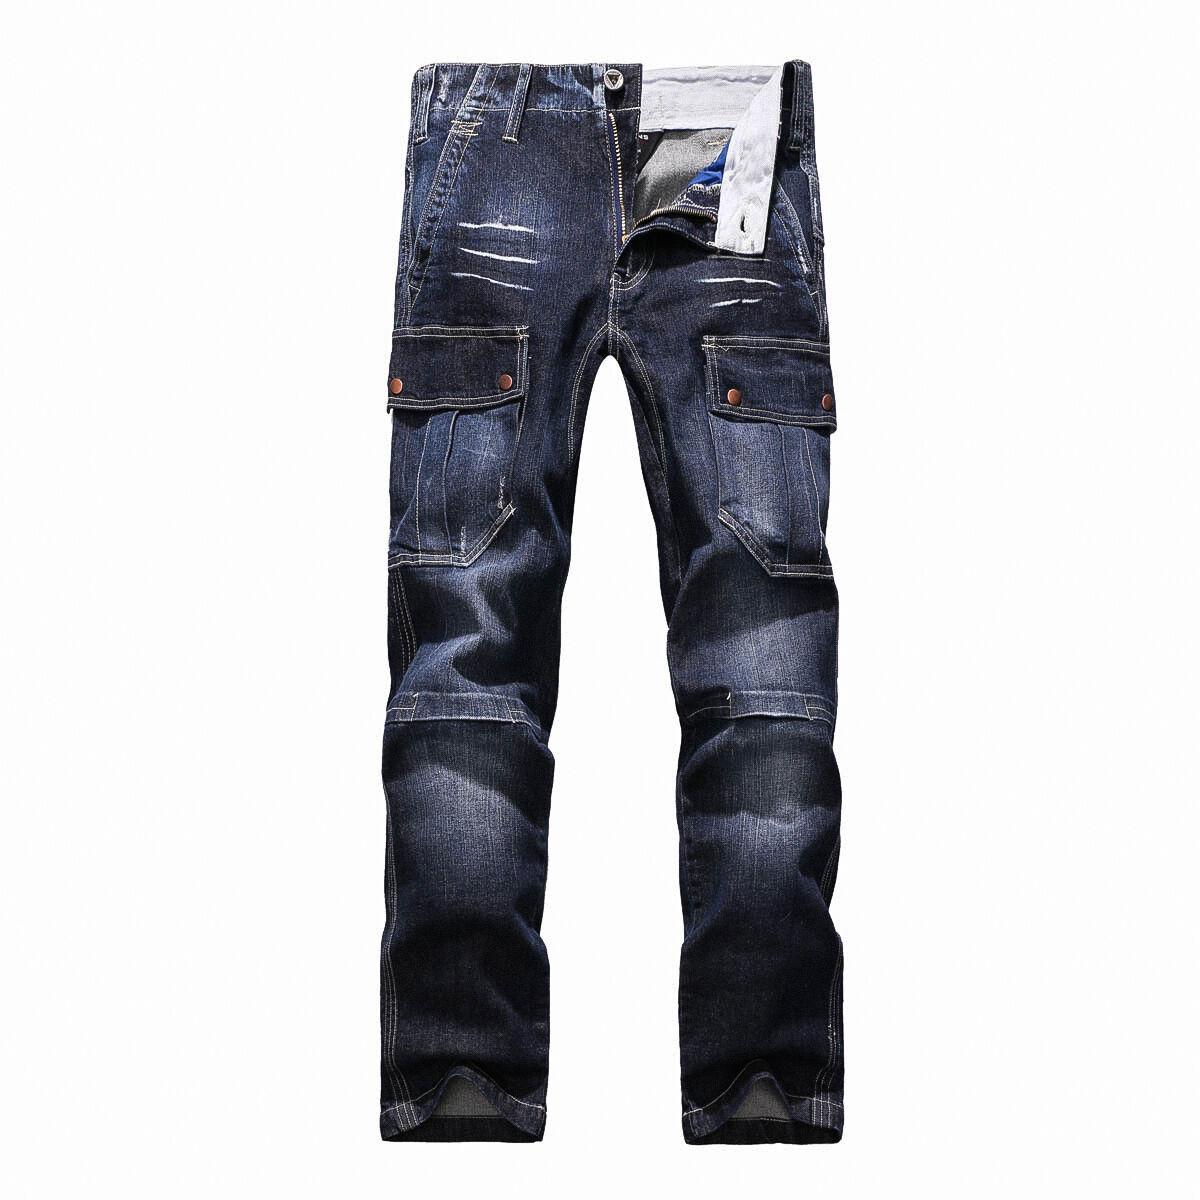 FOX JEANS Men's Monroe Regular Fit Straight bluee Denim Mens Cargo Jeans SIZE 32